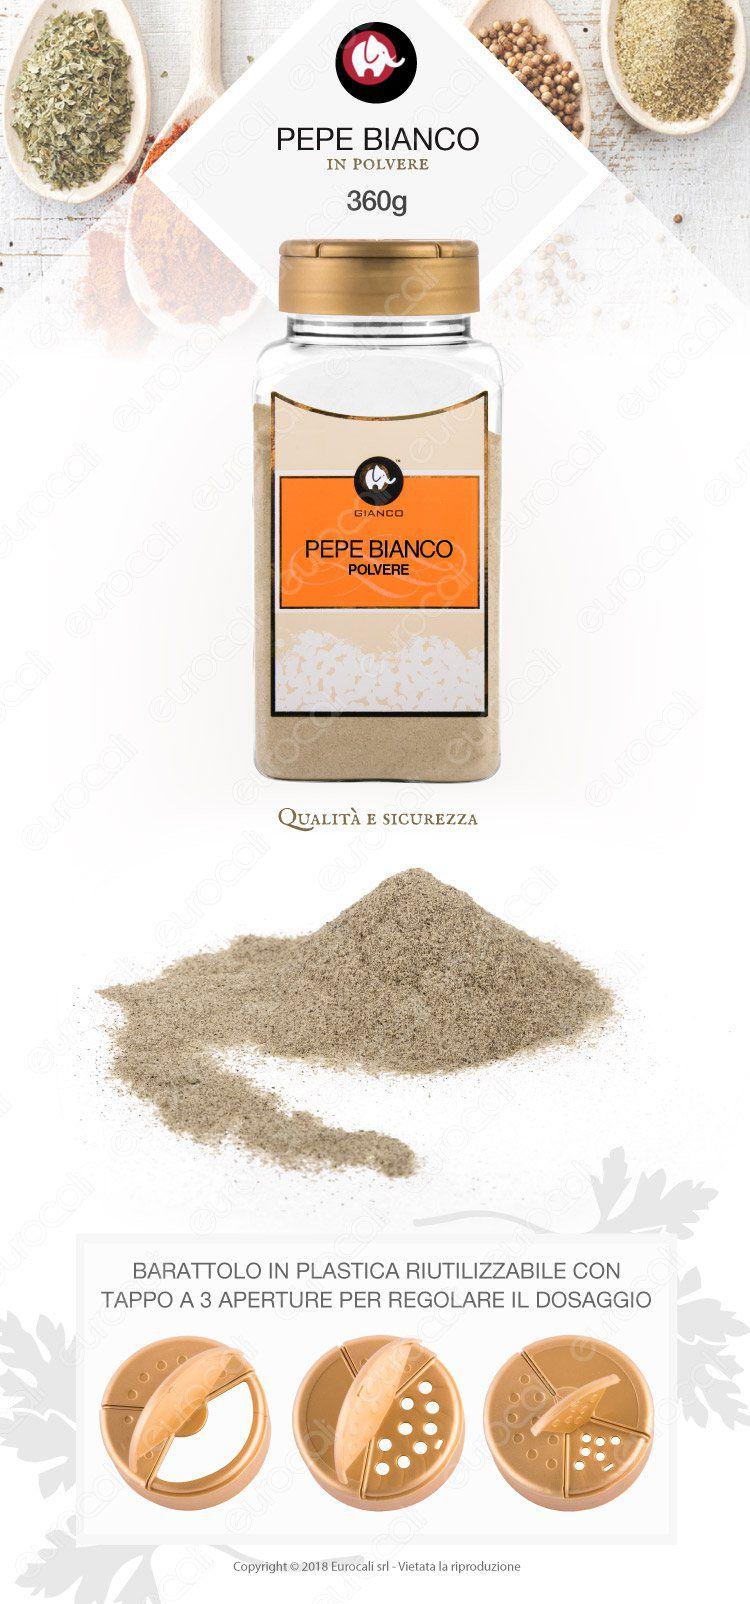 Gianco Pepe Bianco Polvere